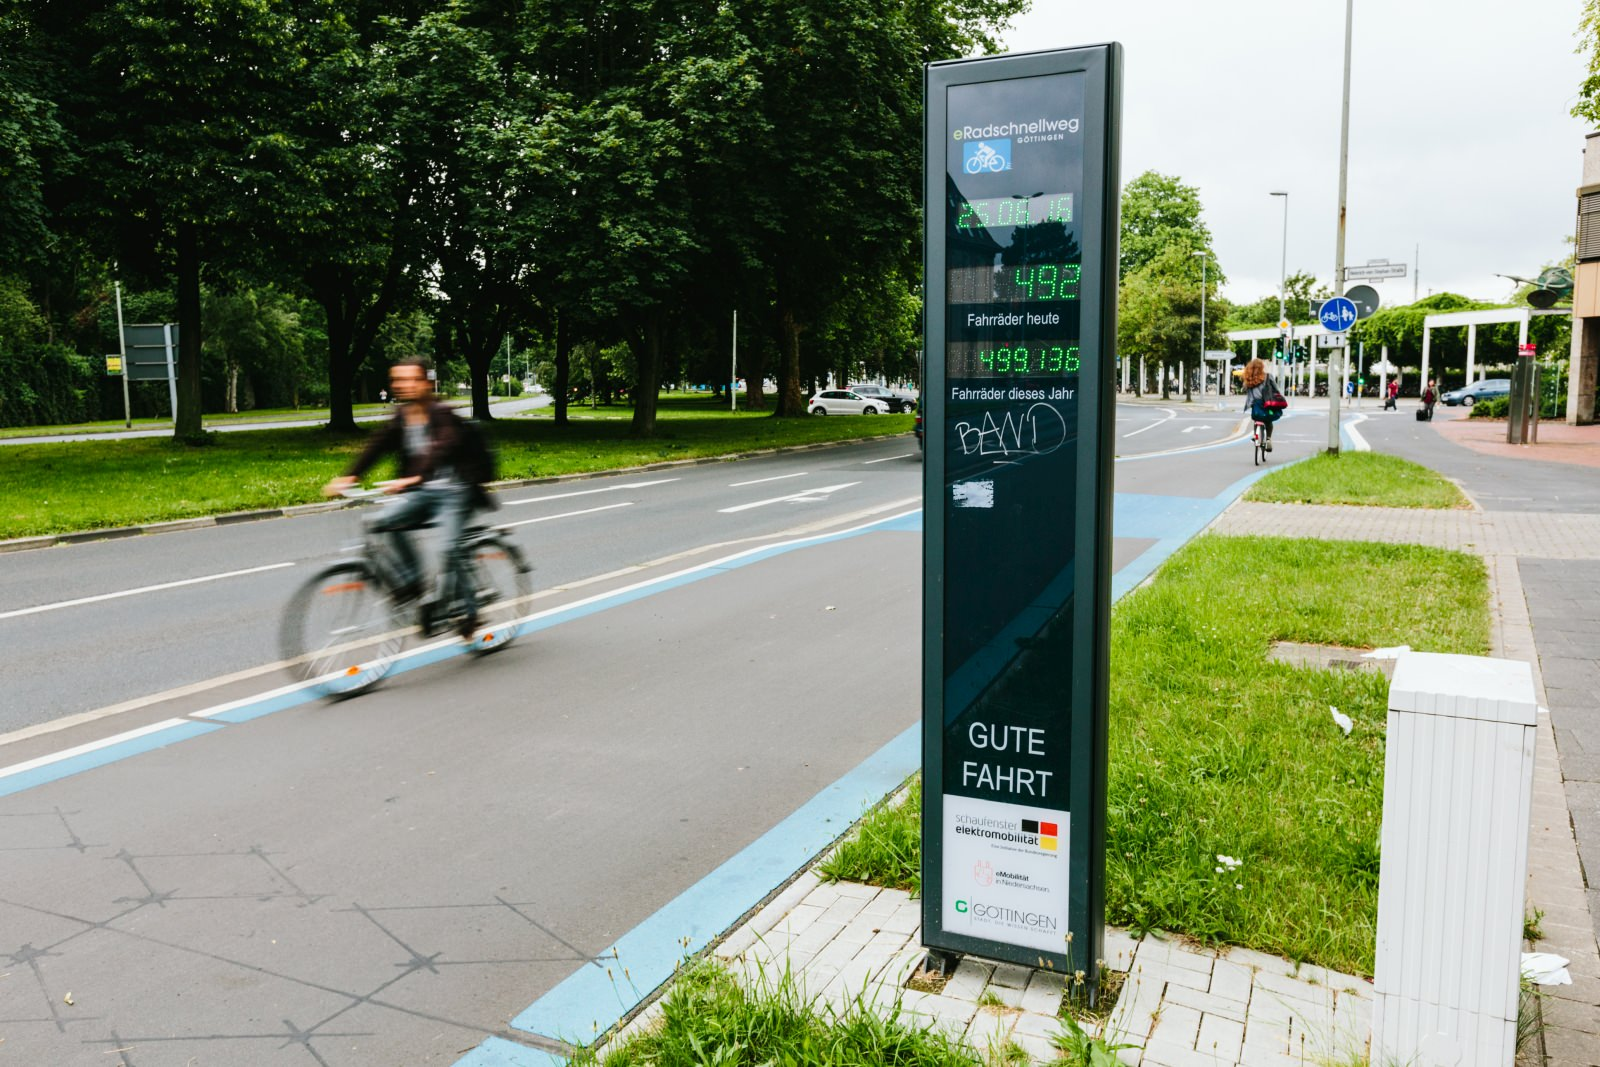 Radverkehrszählstelle Göttingen Erhebung